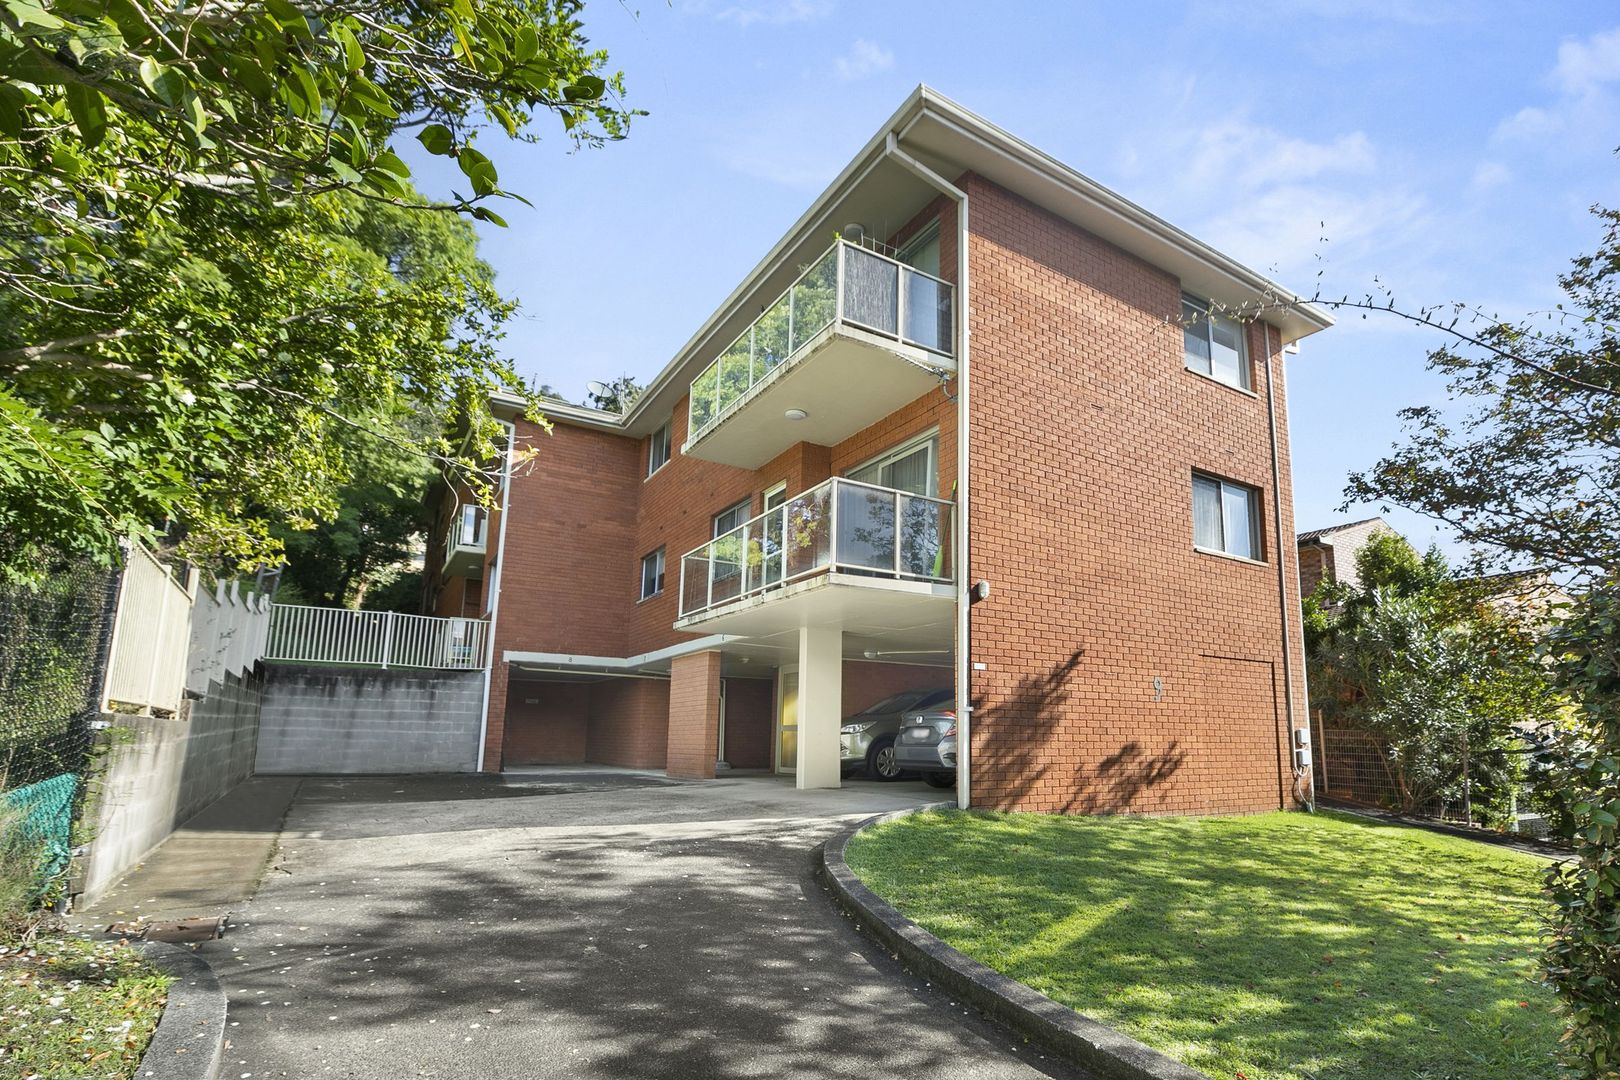 7/9 Ward Street, Gosford NSW 2250, Image 0